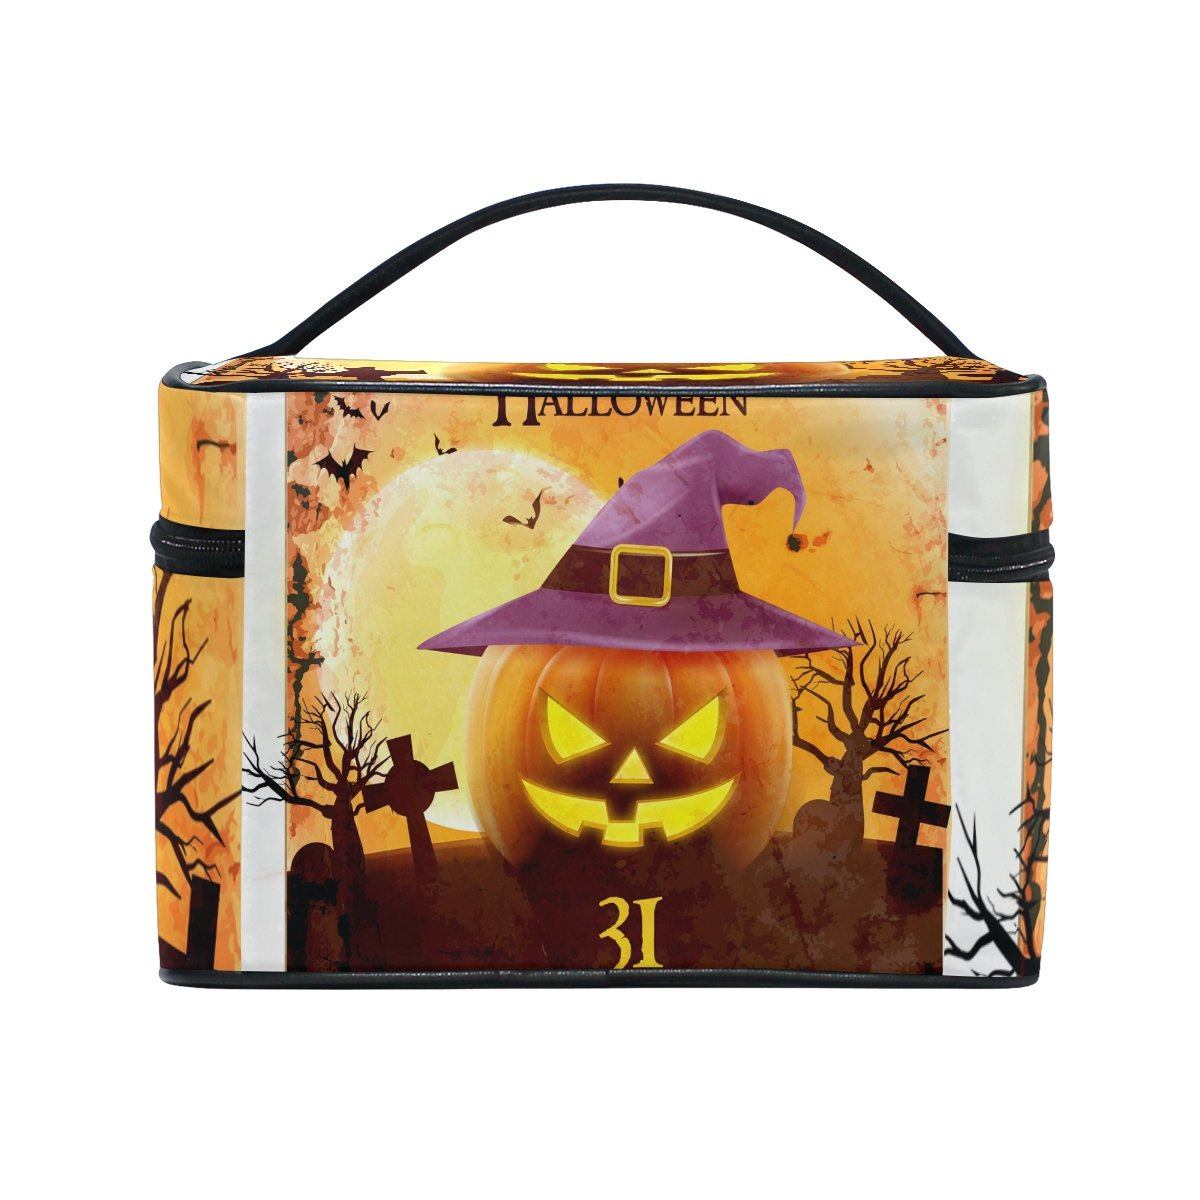 Amazon.com : ALIREA Halloween Smiling Pumpkin Cosmetic Bag Travel Makeup Train Cases Storage Organizer : Beauty